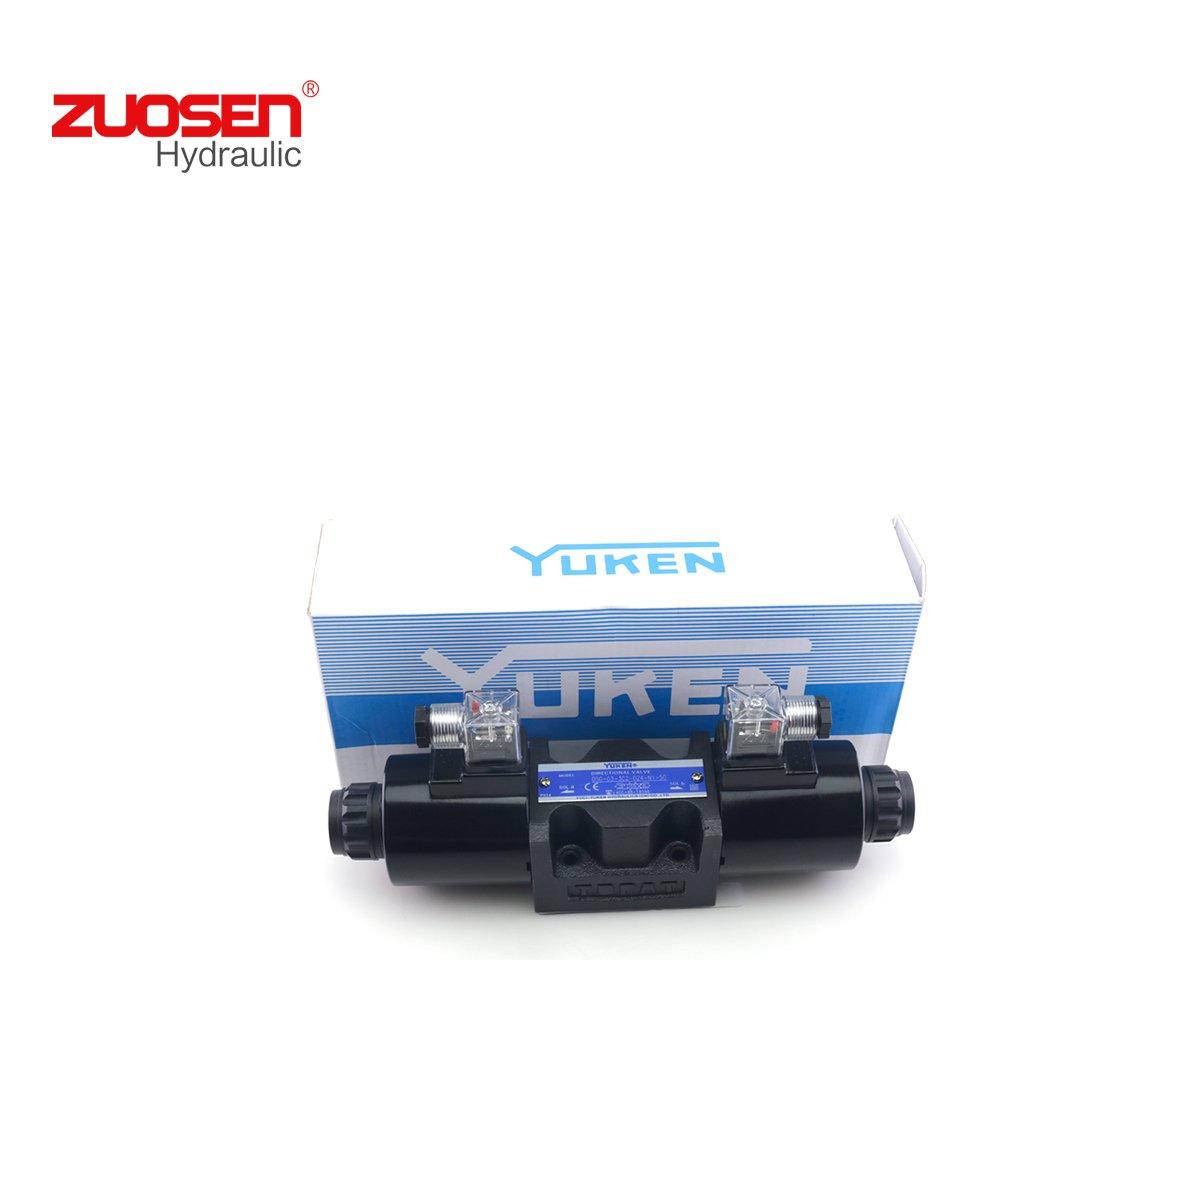 Yuken DSG-03-3C2-D24-N1-50 Hydraulic Valves